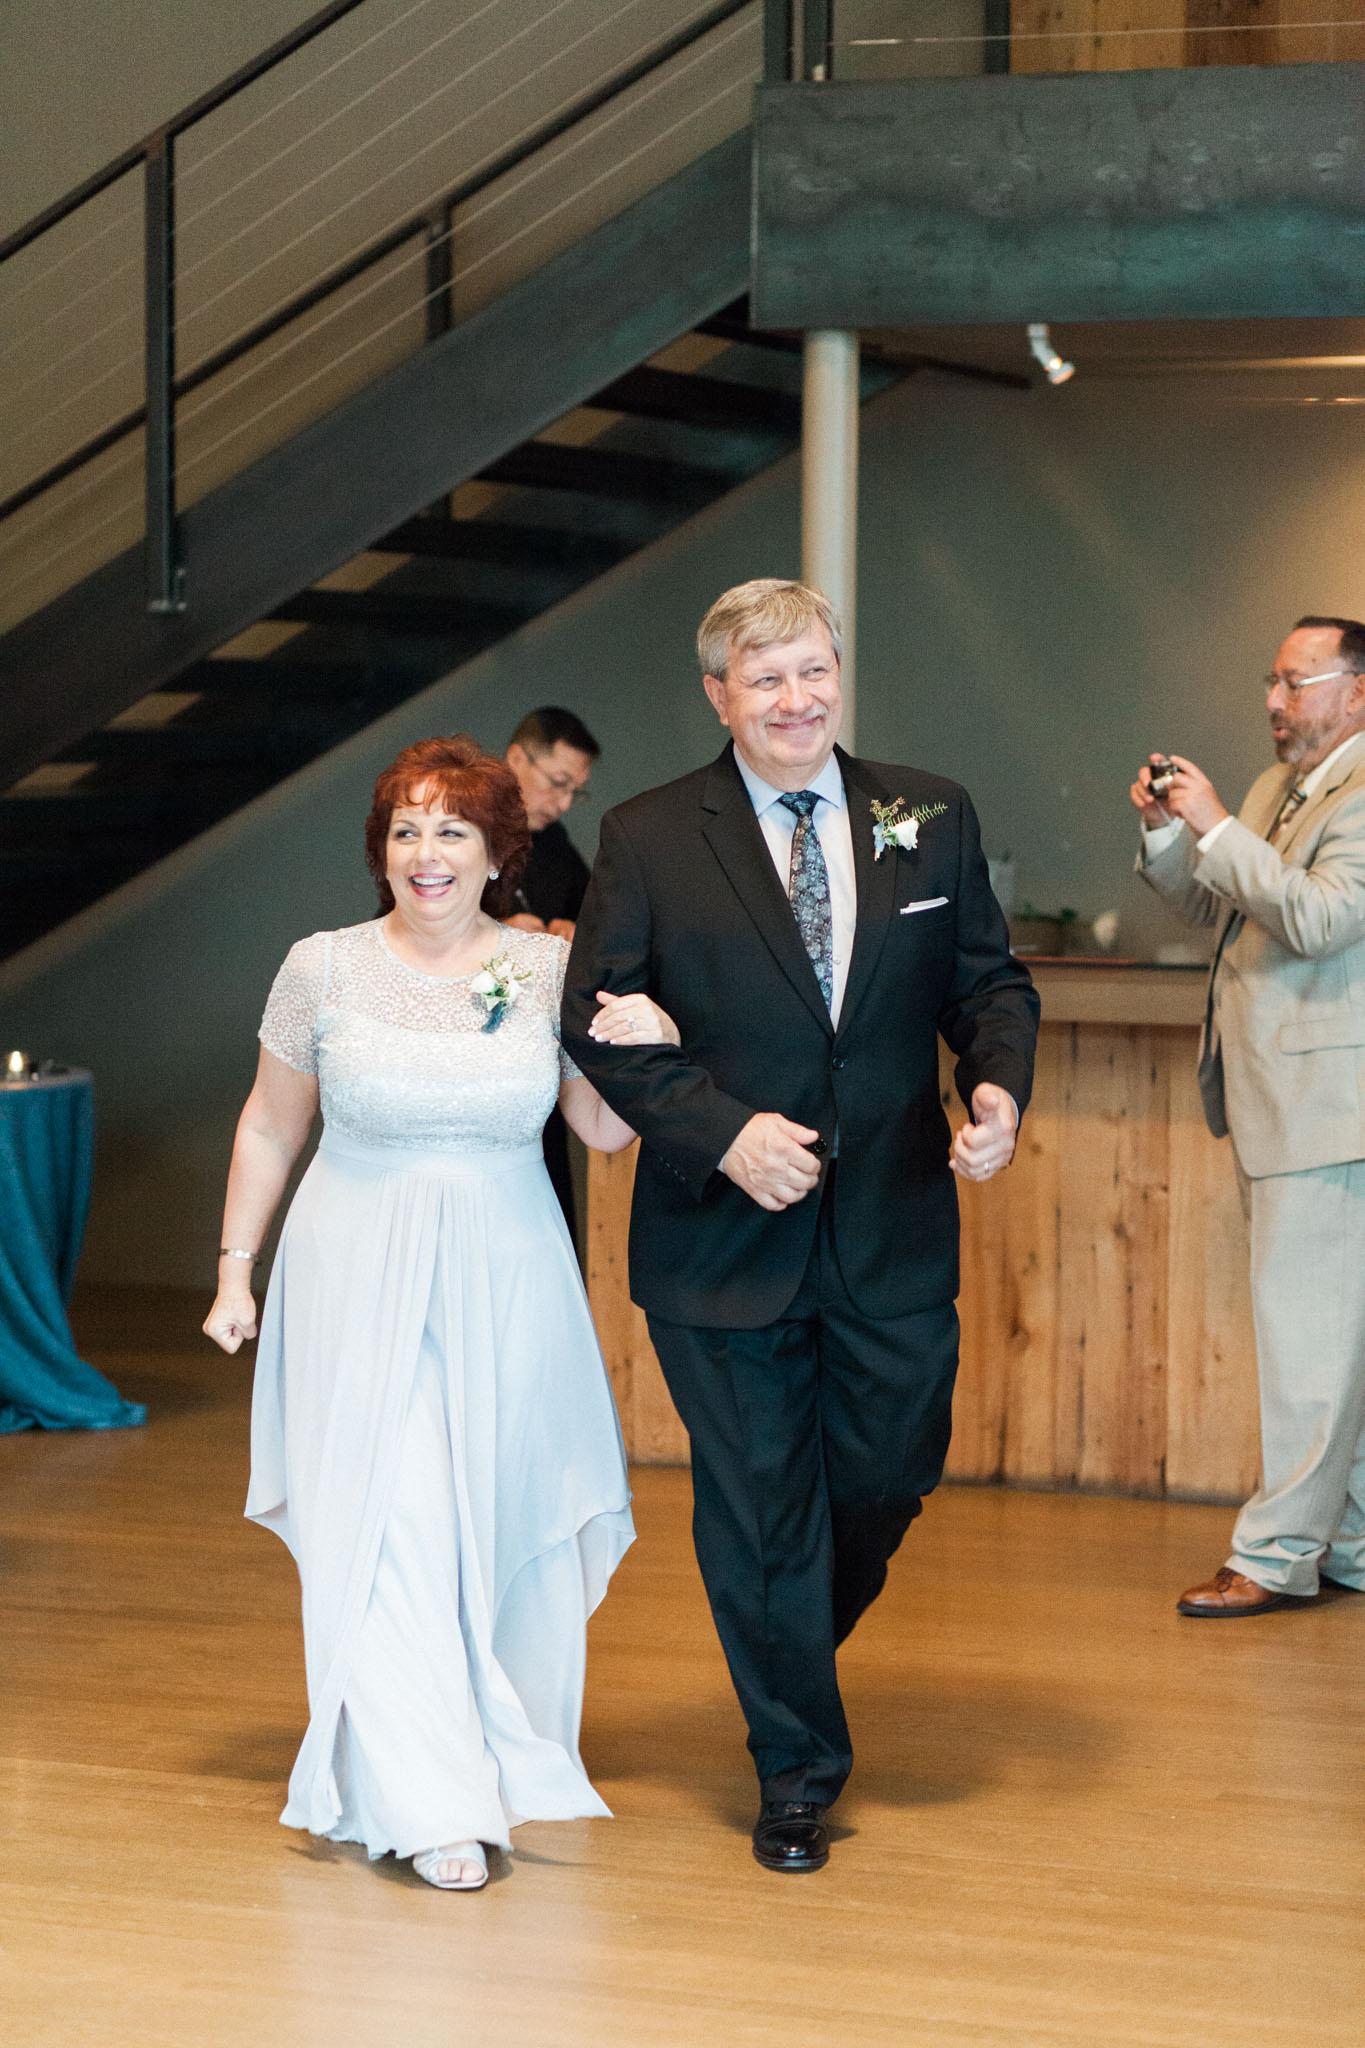 HiloandGinger-Brian+Dina_Weddingday_SneakPeek-46.jpg